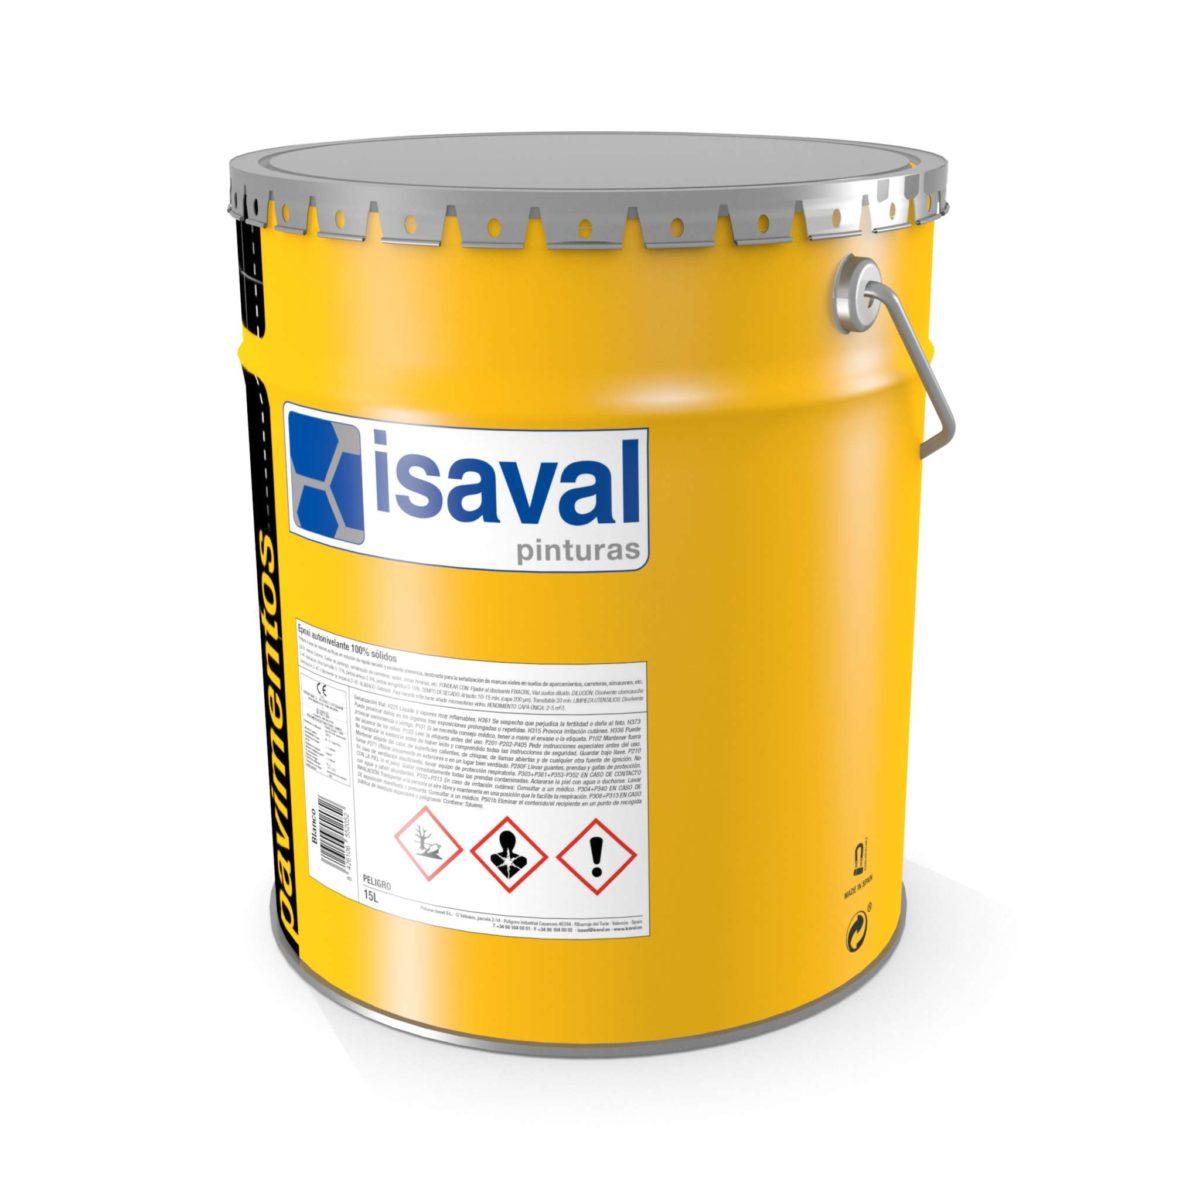 Epoxi autonivelante 100% sólidos. Resina epoxi pigmentada de Pinturas Isaval